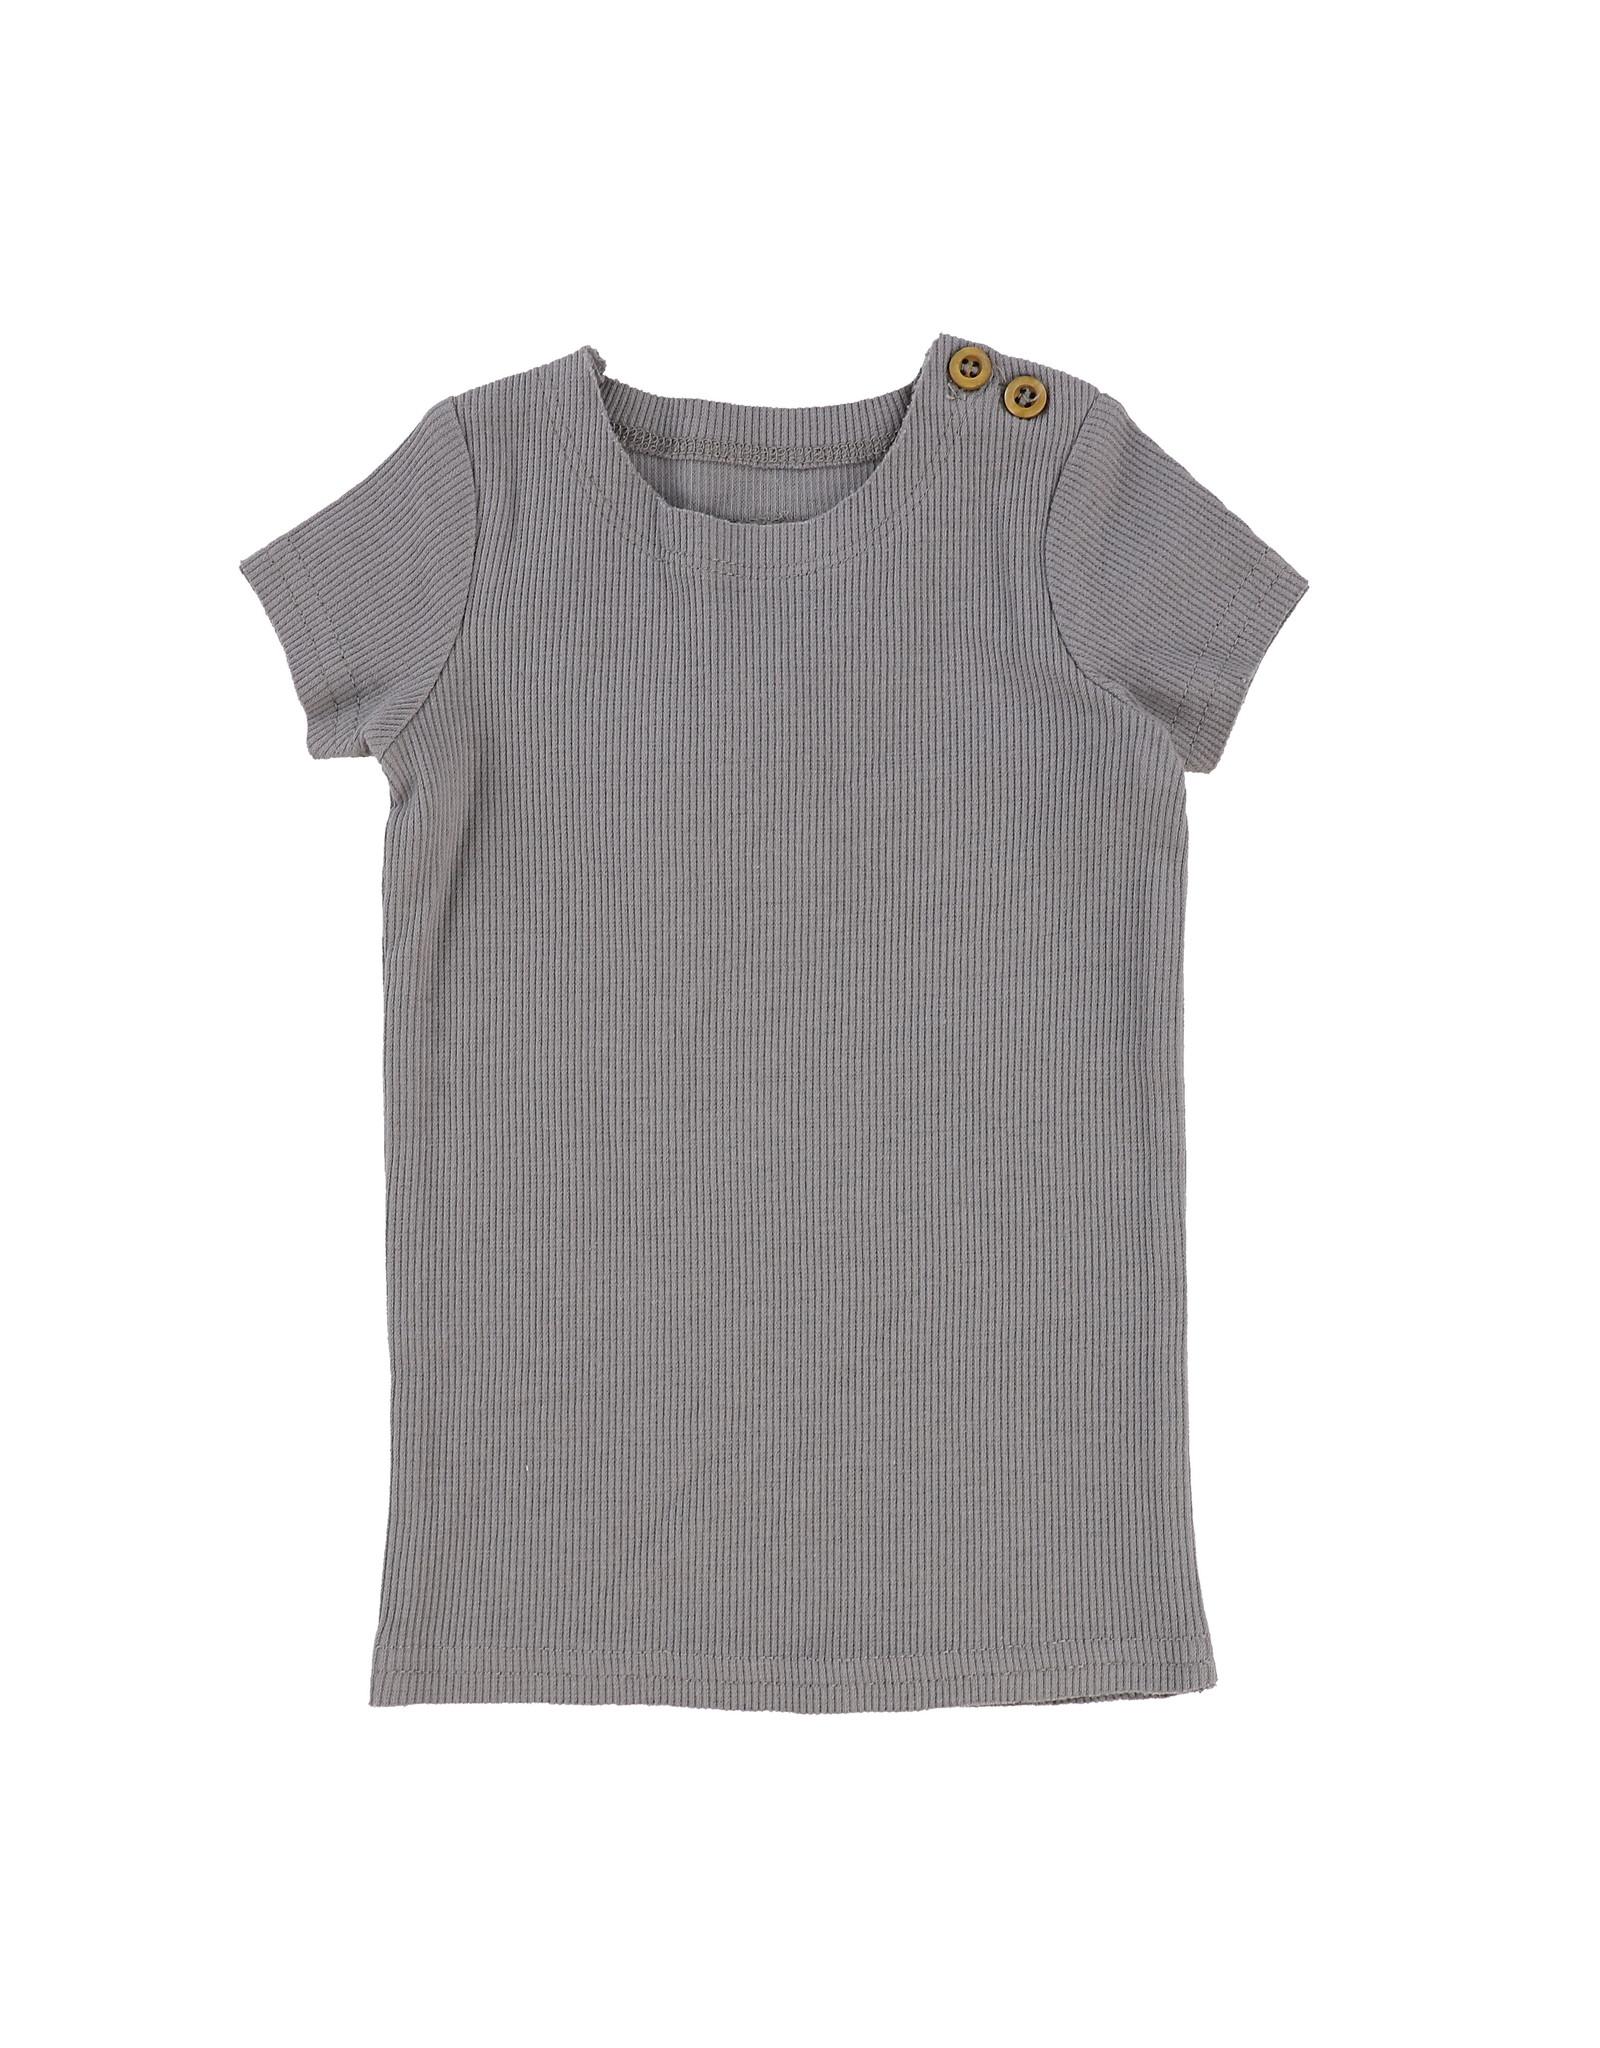 LIL LEGS SS20 Short Sleeve Ribbed T-Shirt